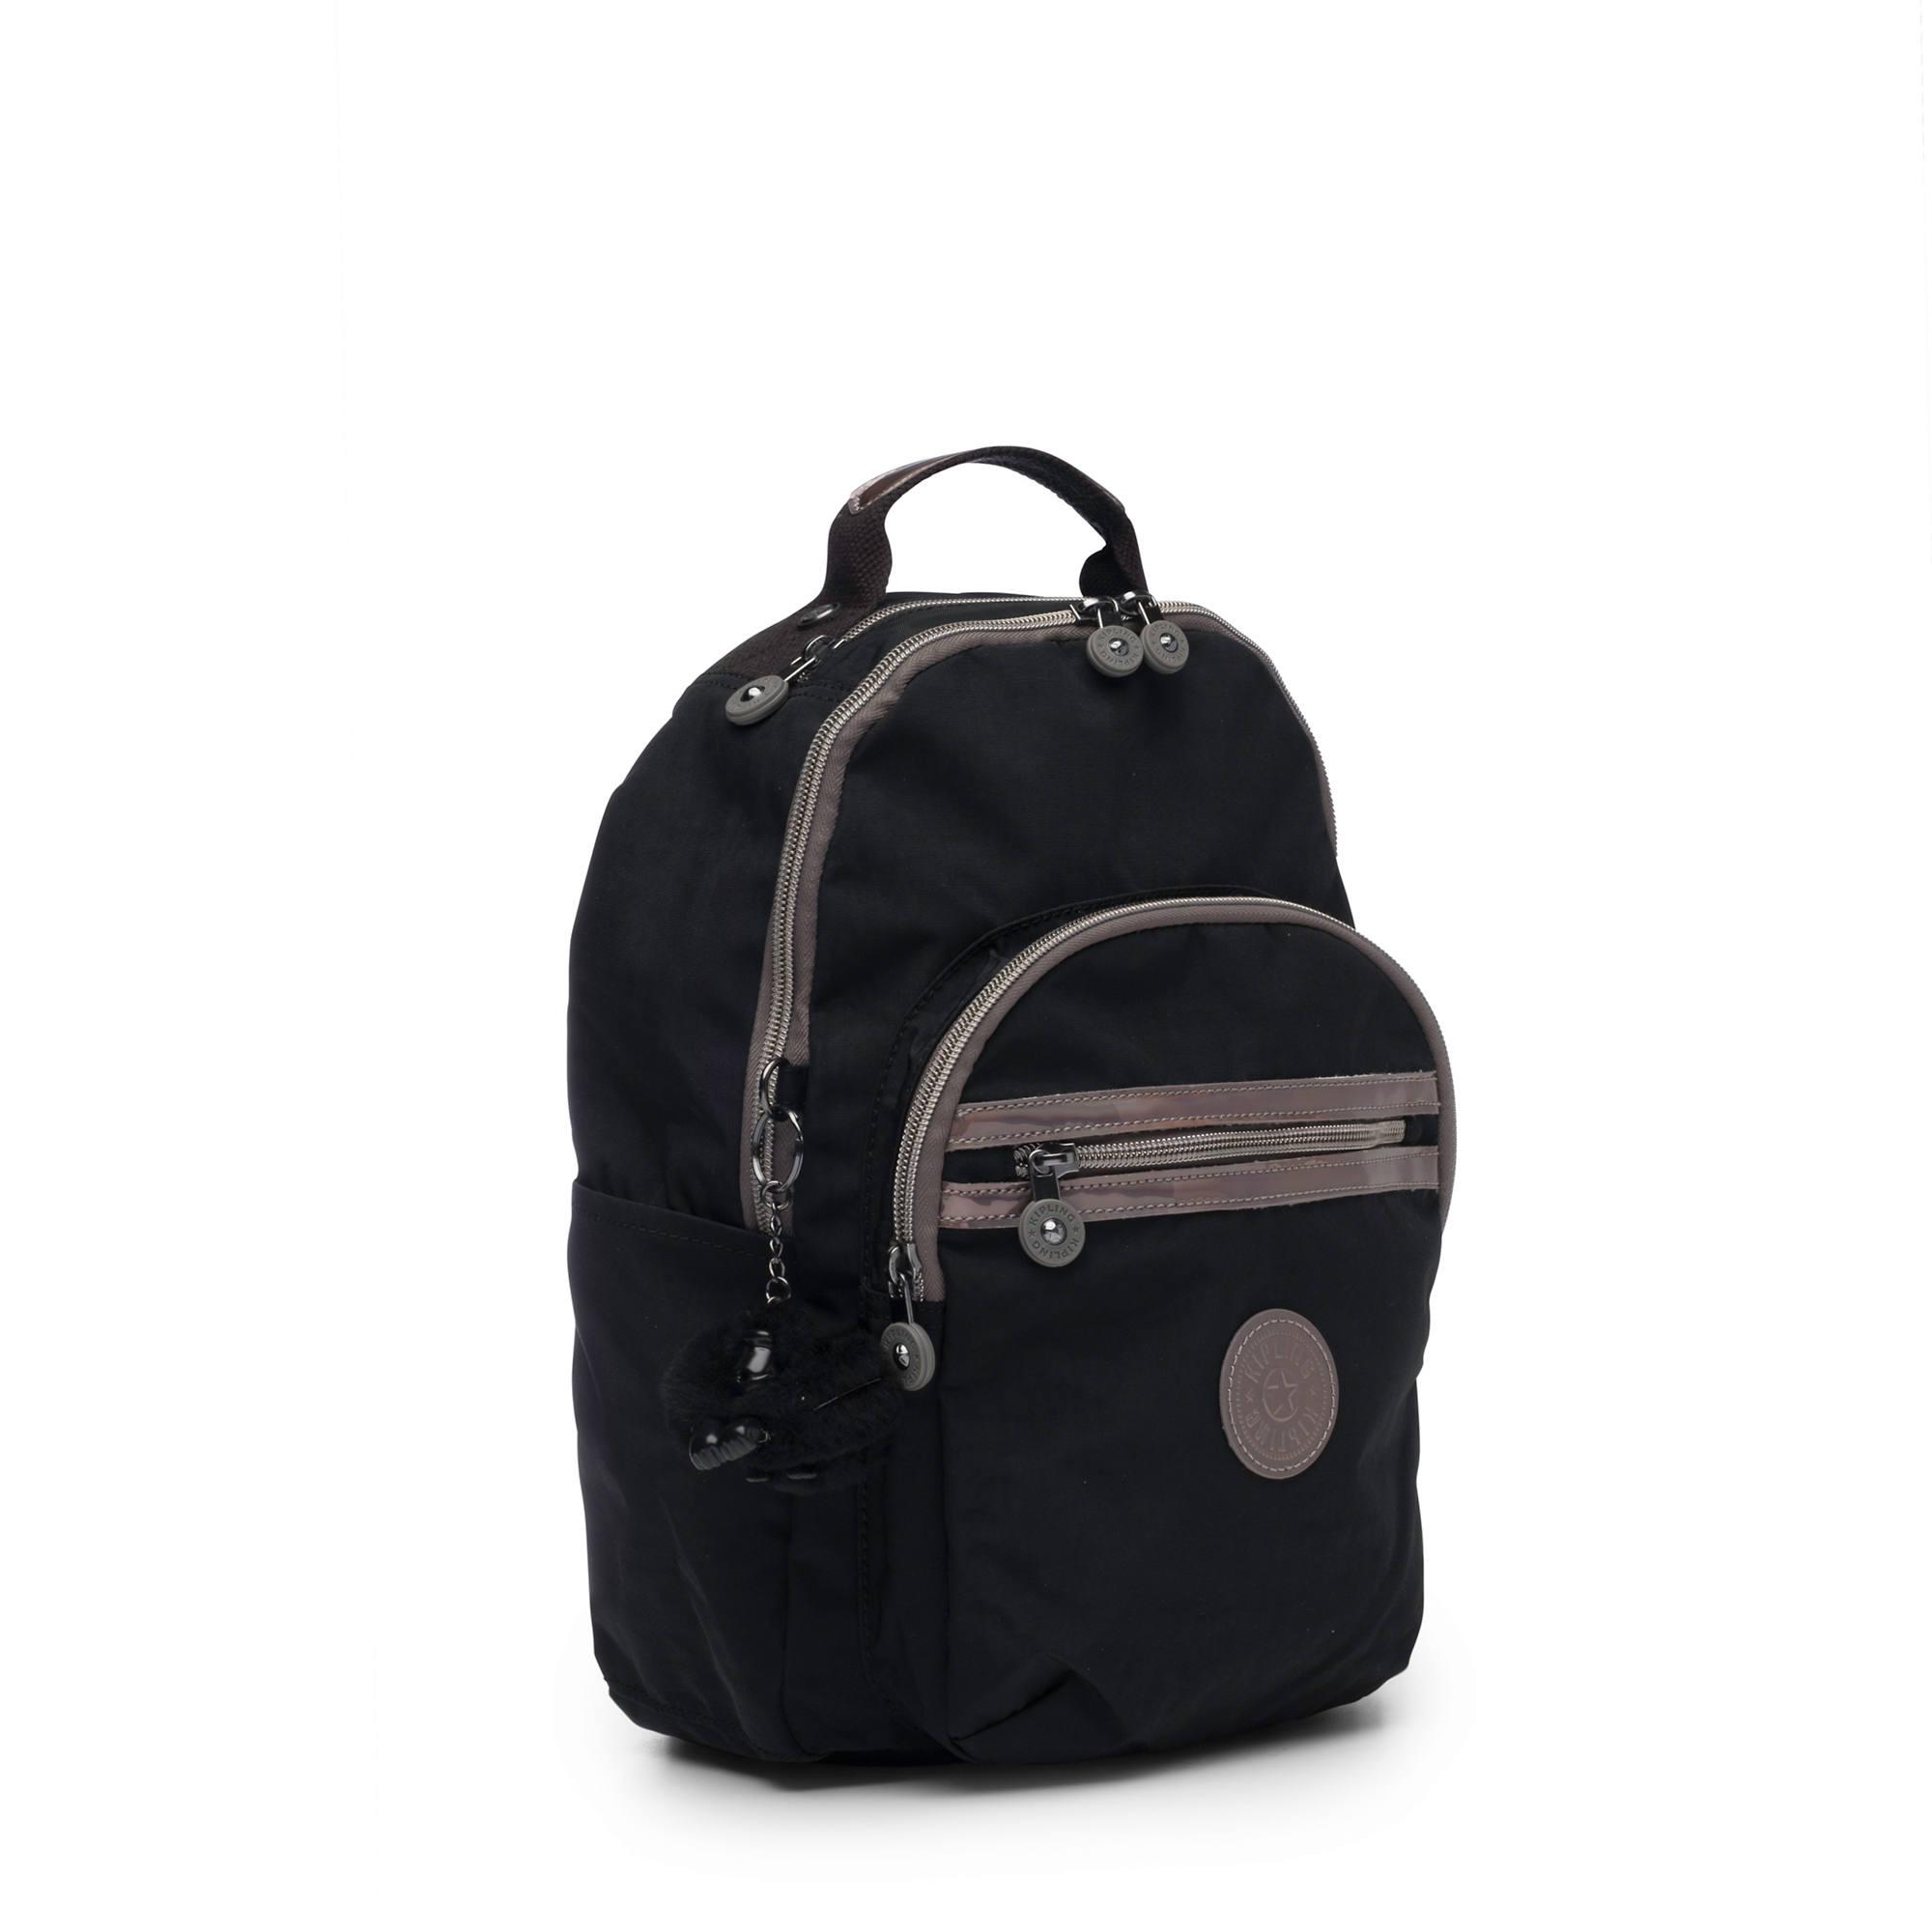 Kipling-Seoul-Small-11-034-Laptop-Backpack thumbnail 11